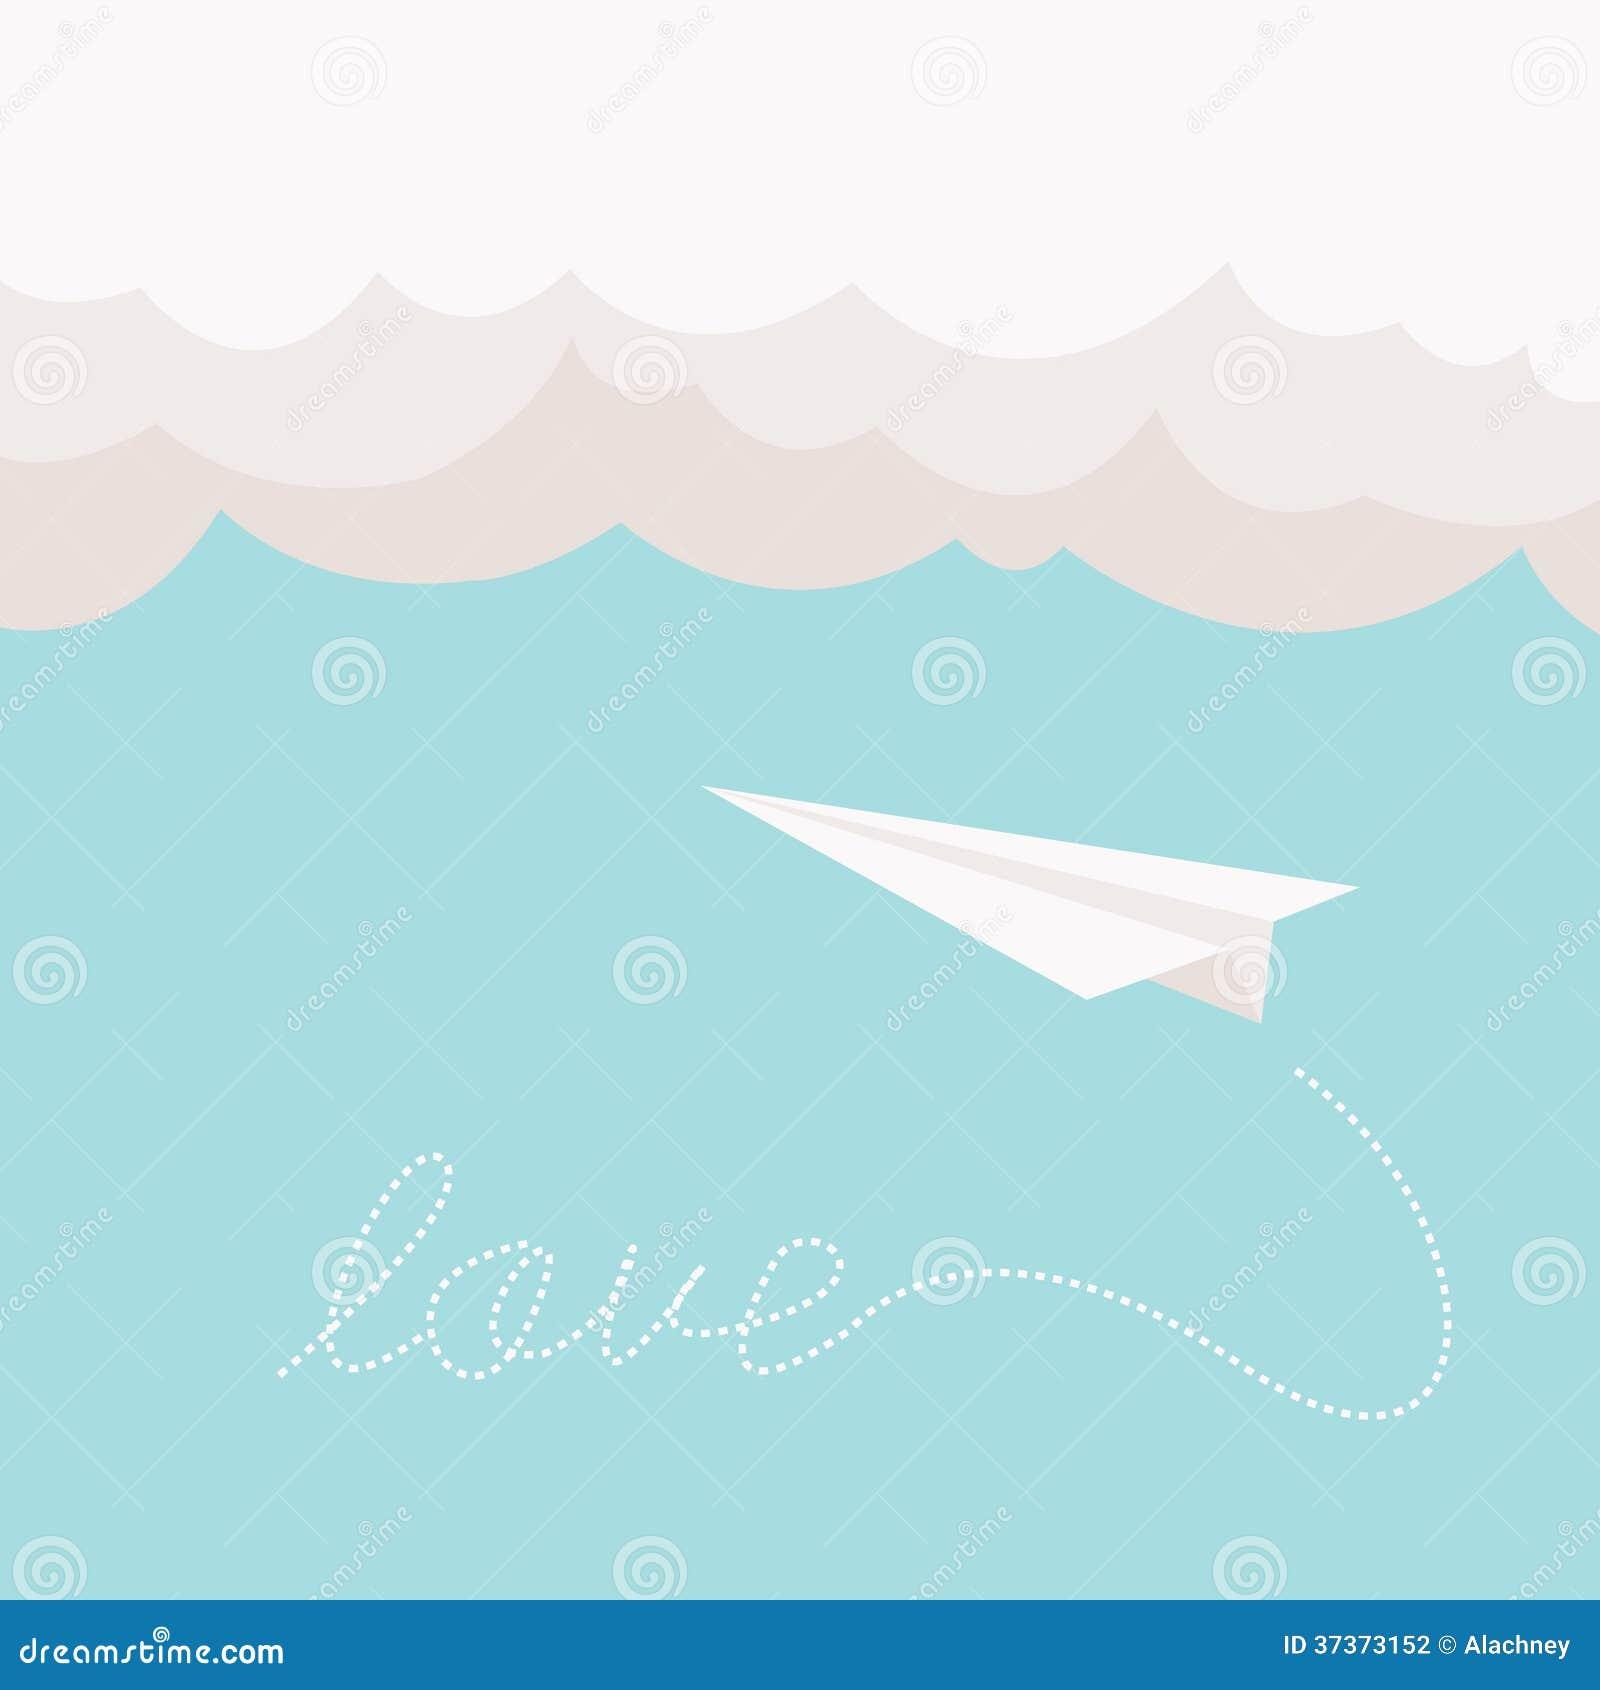 paper plane stock illustration - photo #3